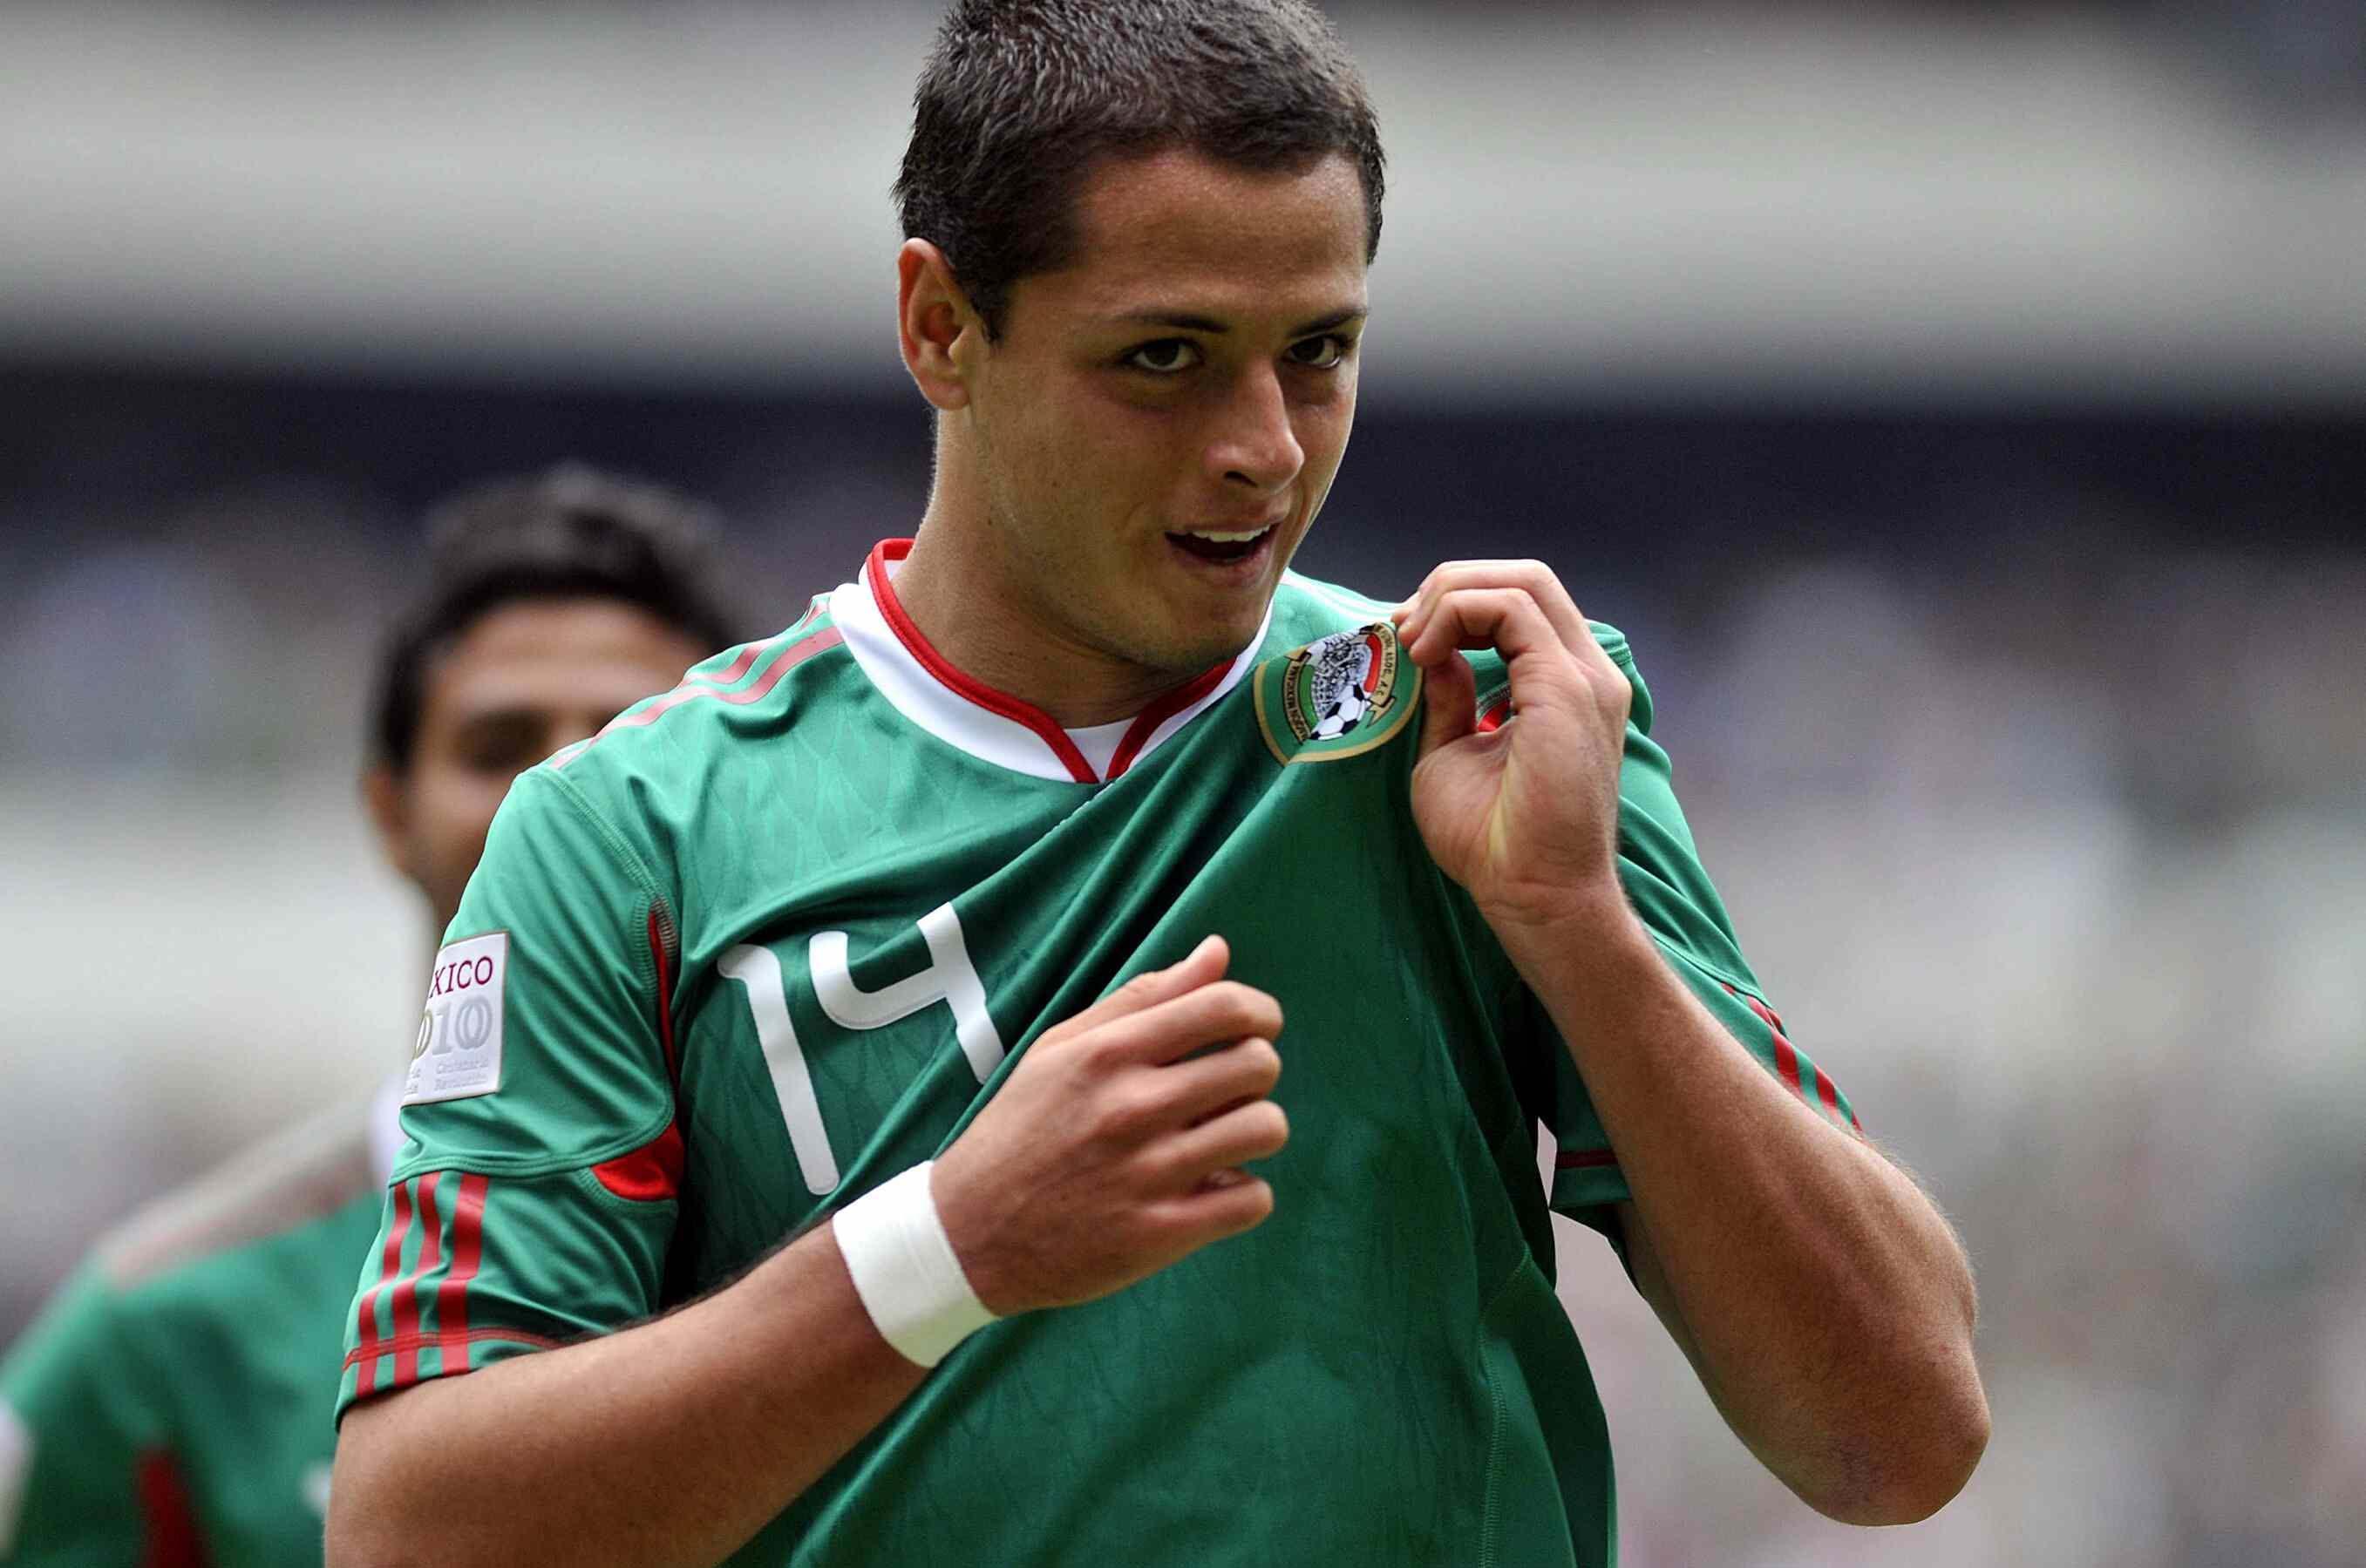 Javier Hernandez photo gallery - high quality pics of ...